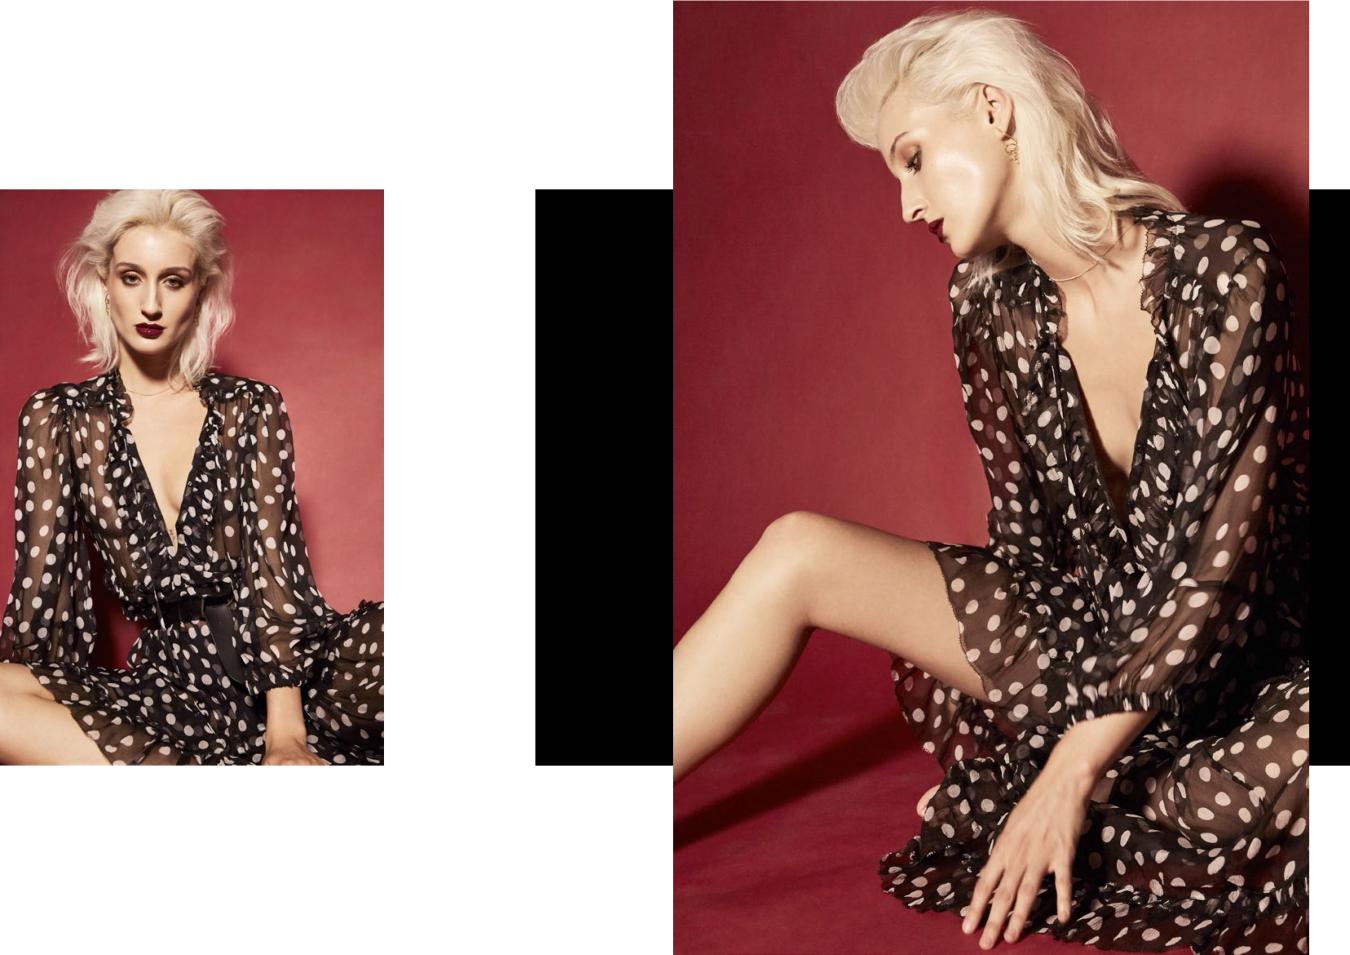 Dress Lee Mathews, Belt stylists own, Jewellery Reliquia